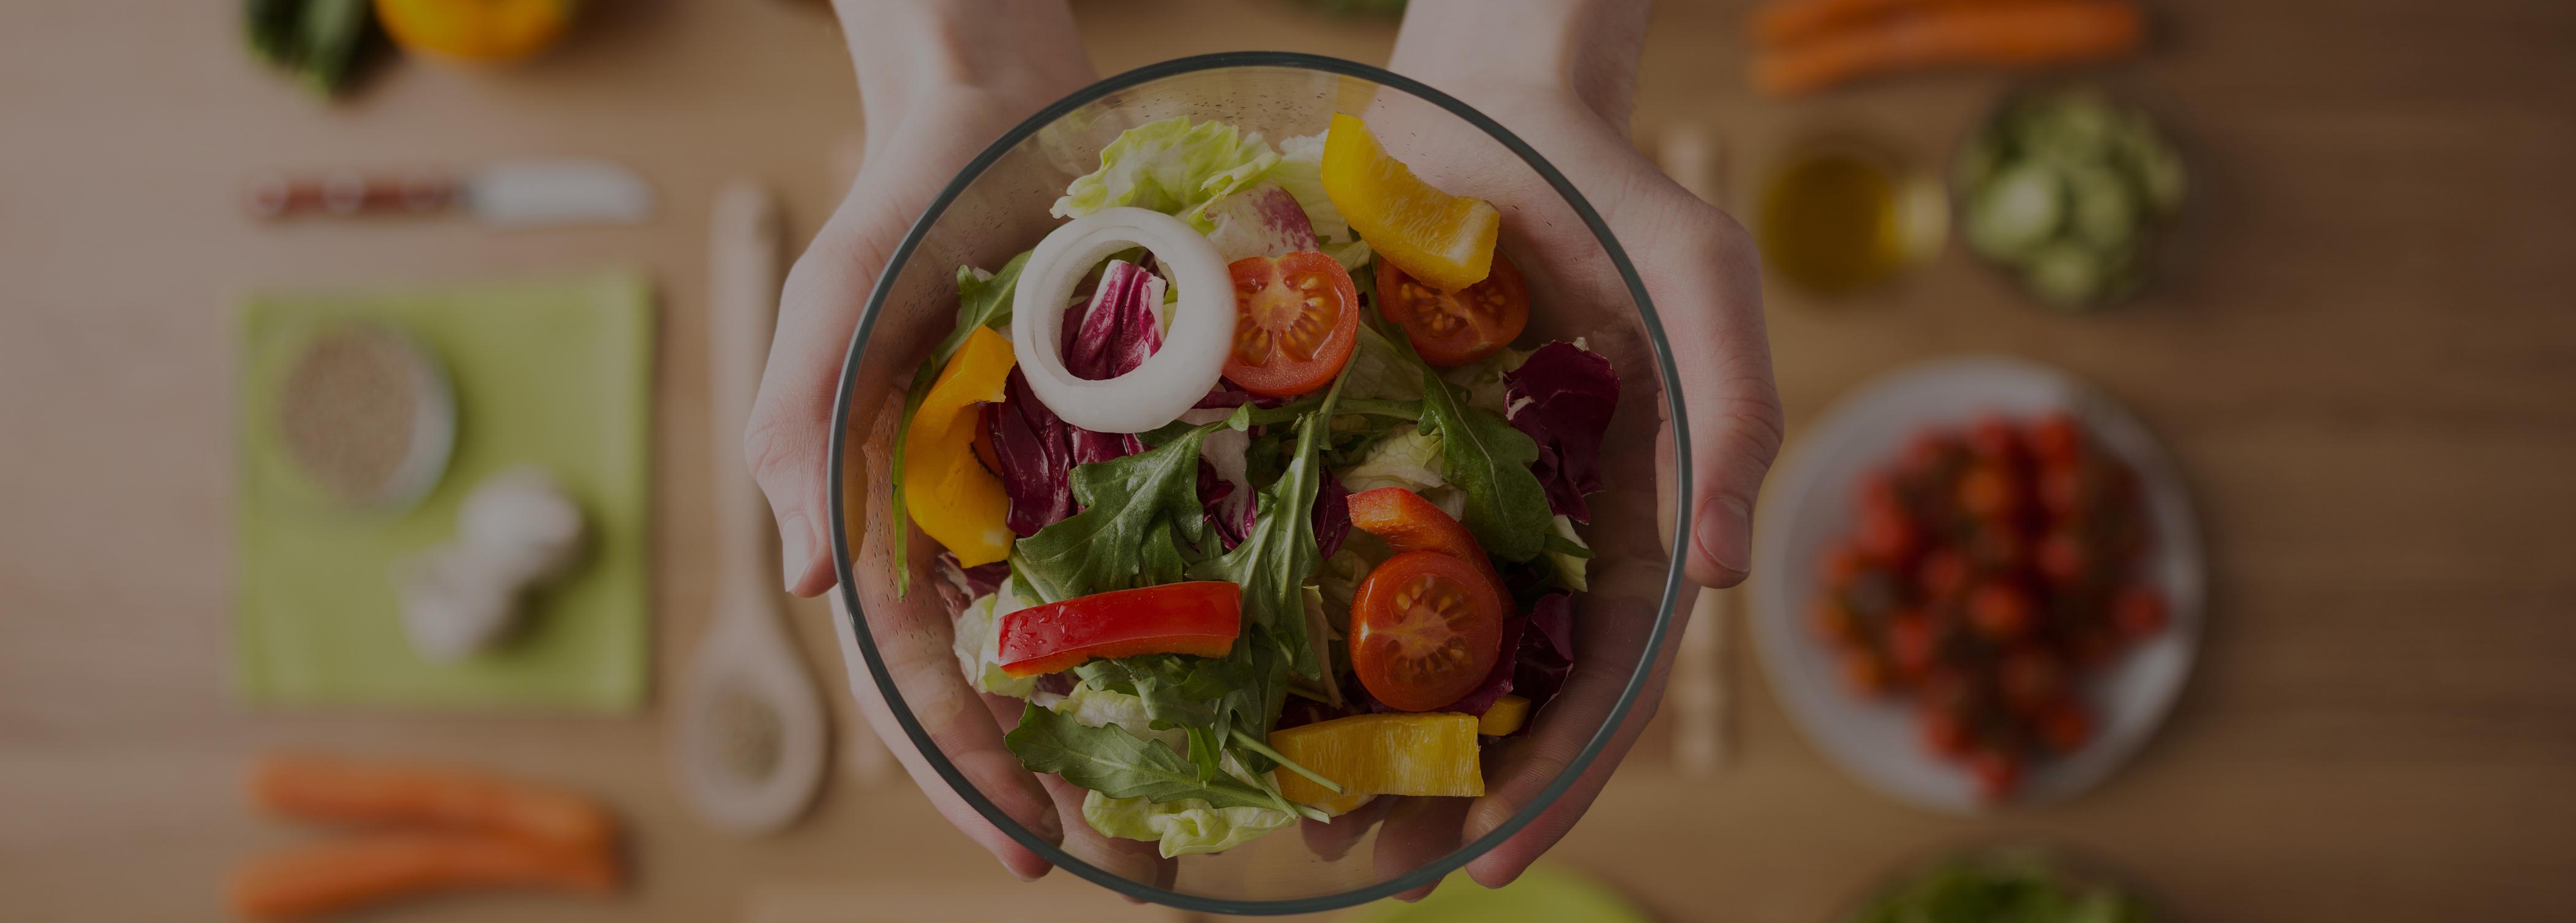 sogeres-salade-fraiche-maison